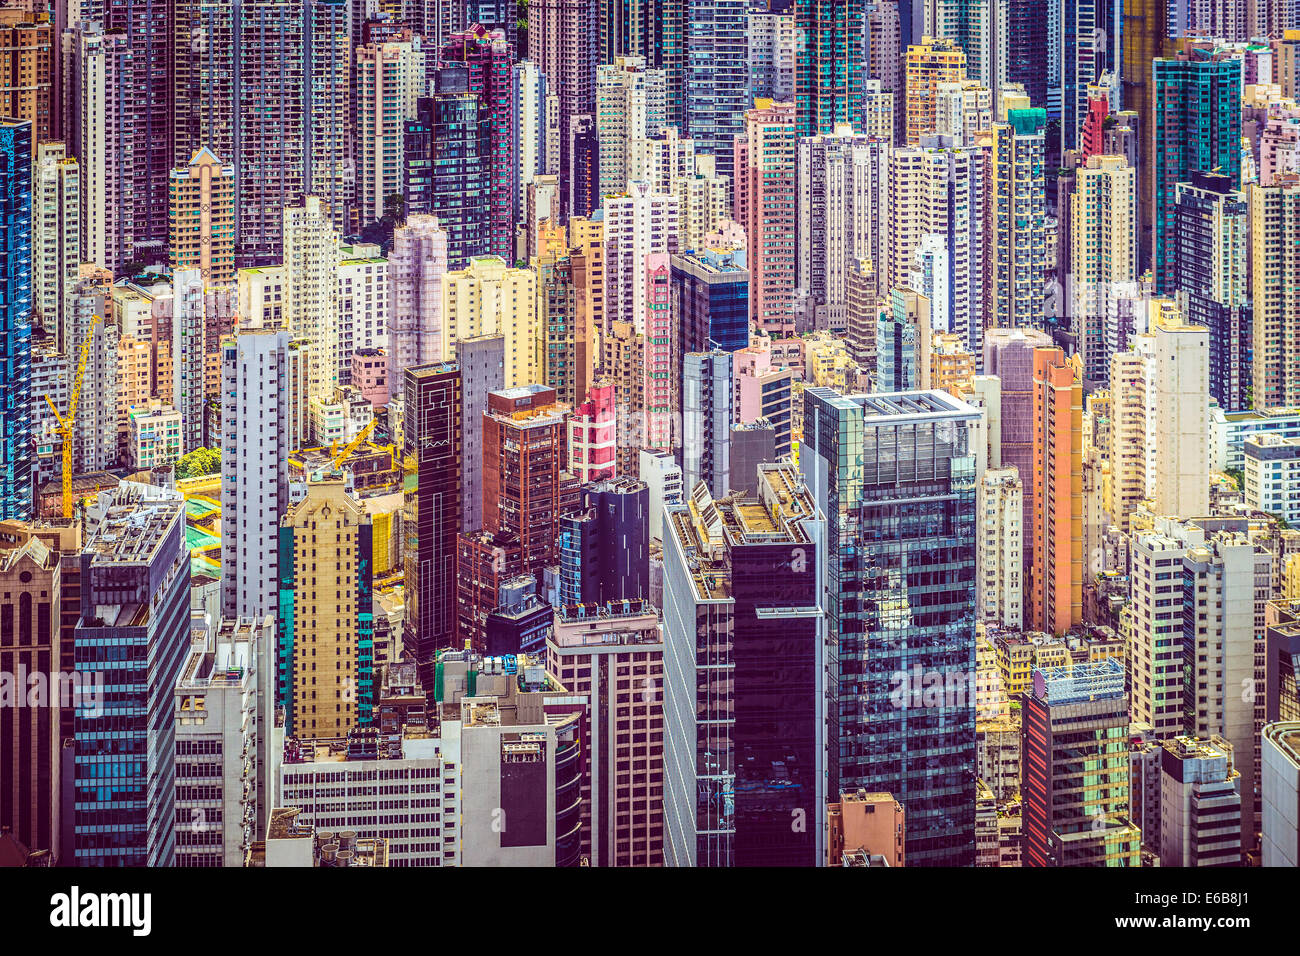 Hong Kong Cina edifici finanziari cityscape. Immagini Stock